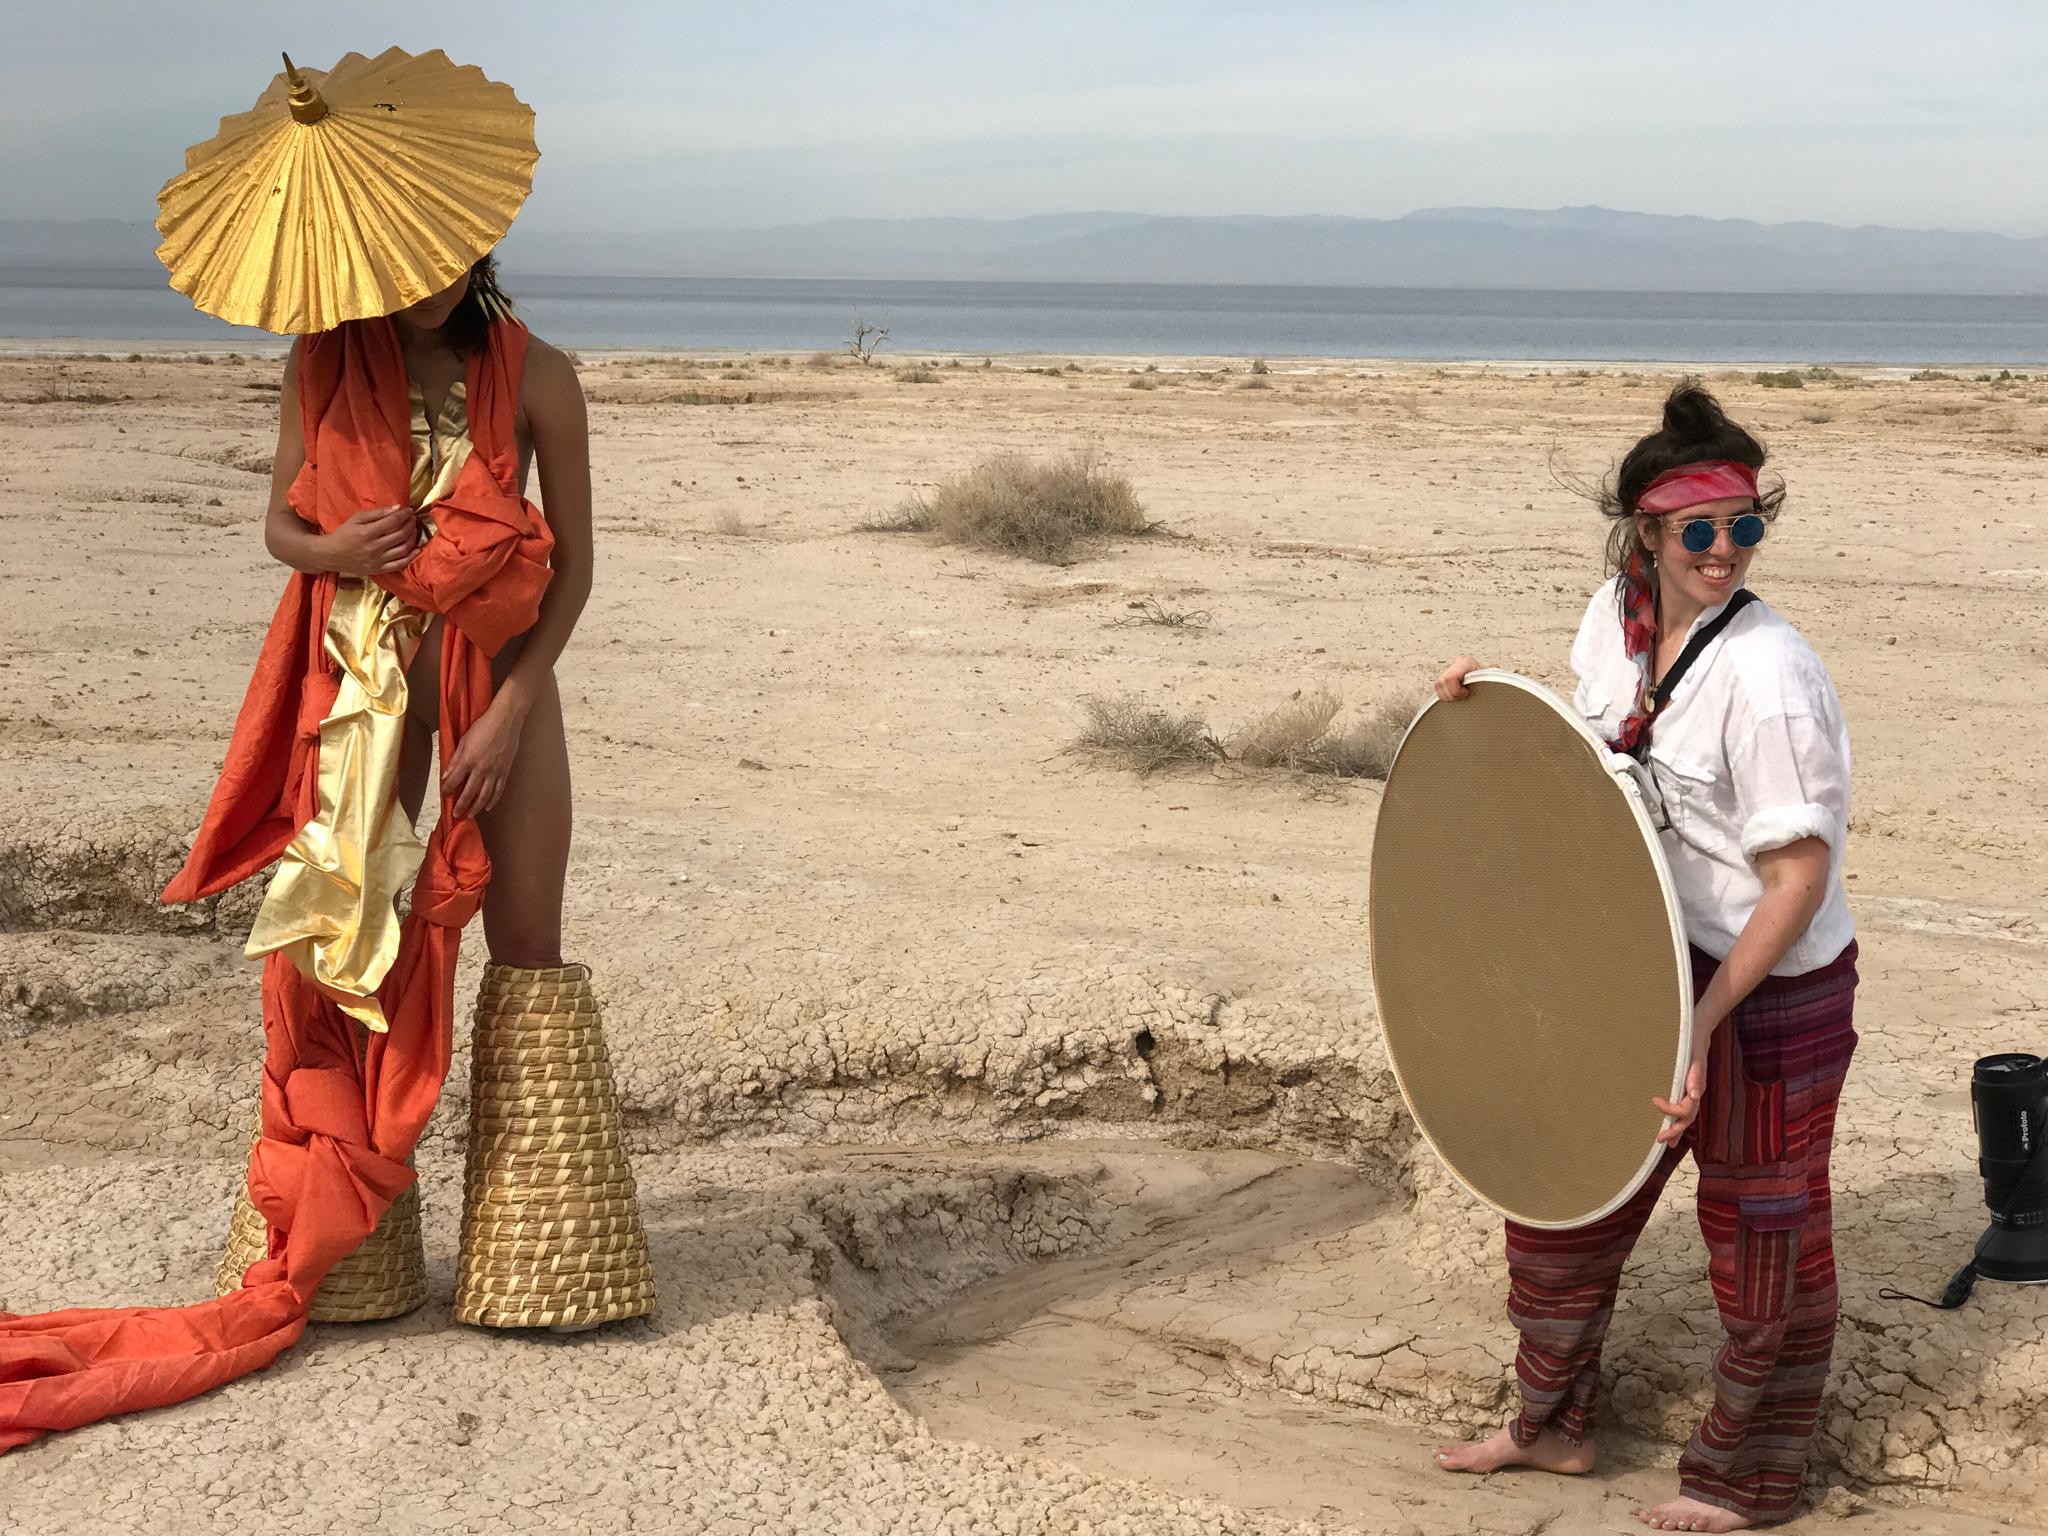 On set for GARB Salton Sea fashion photo/video editorial shoot in LA